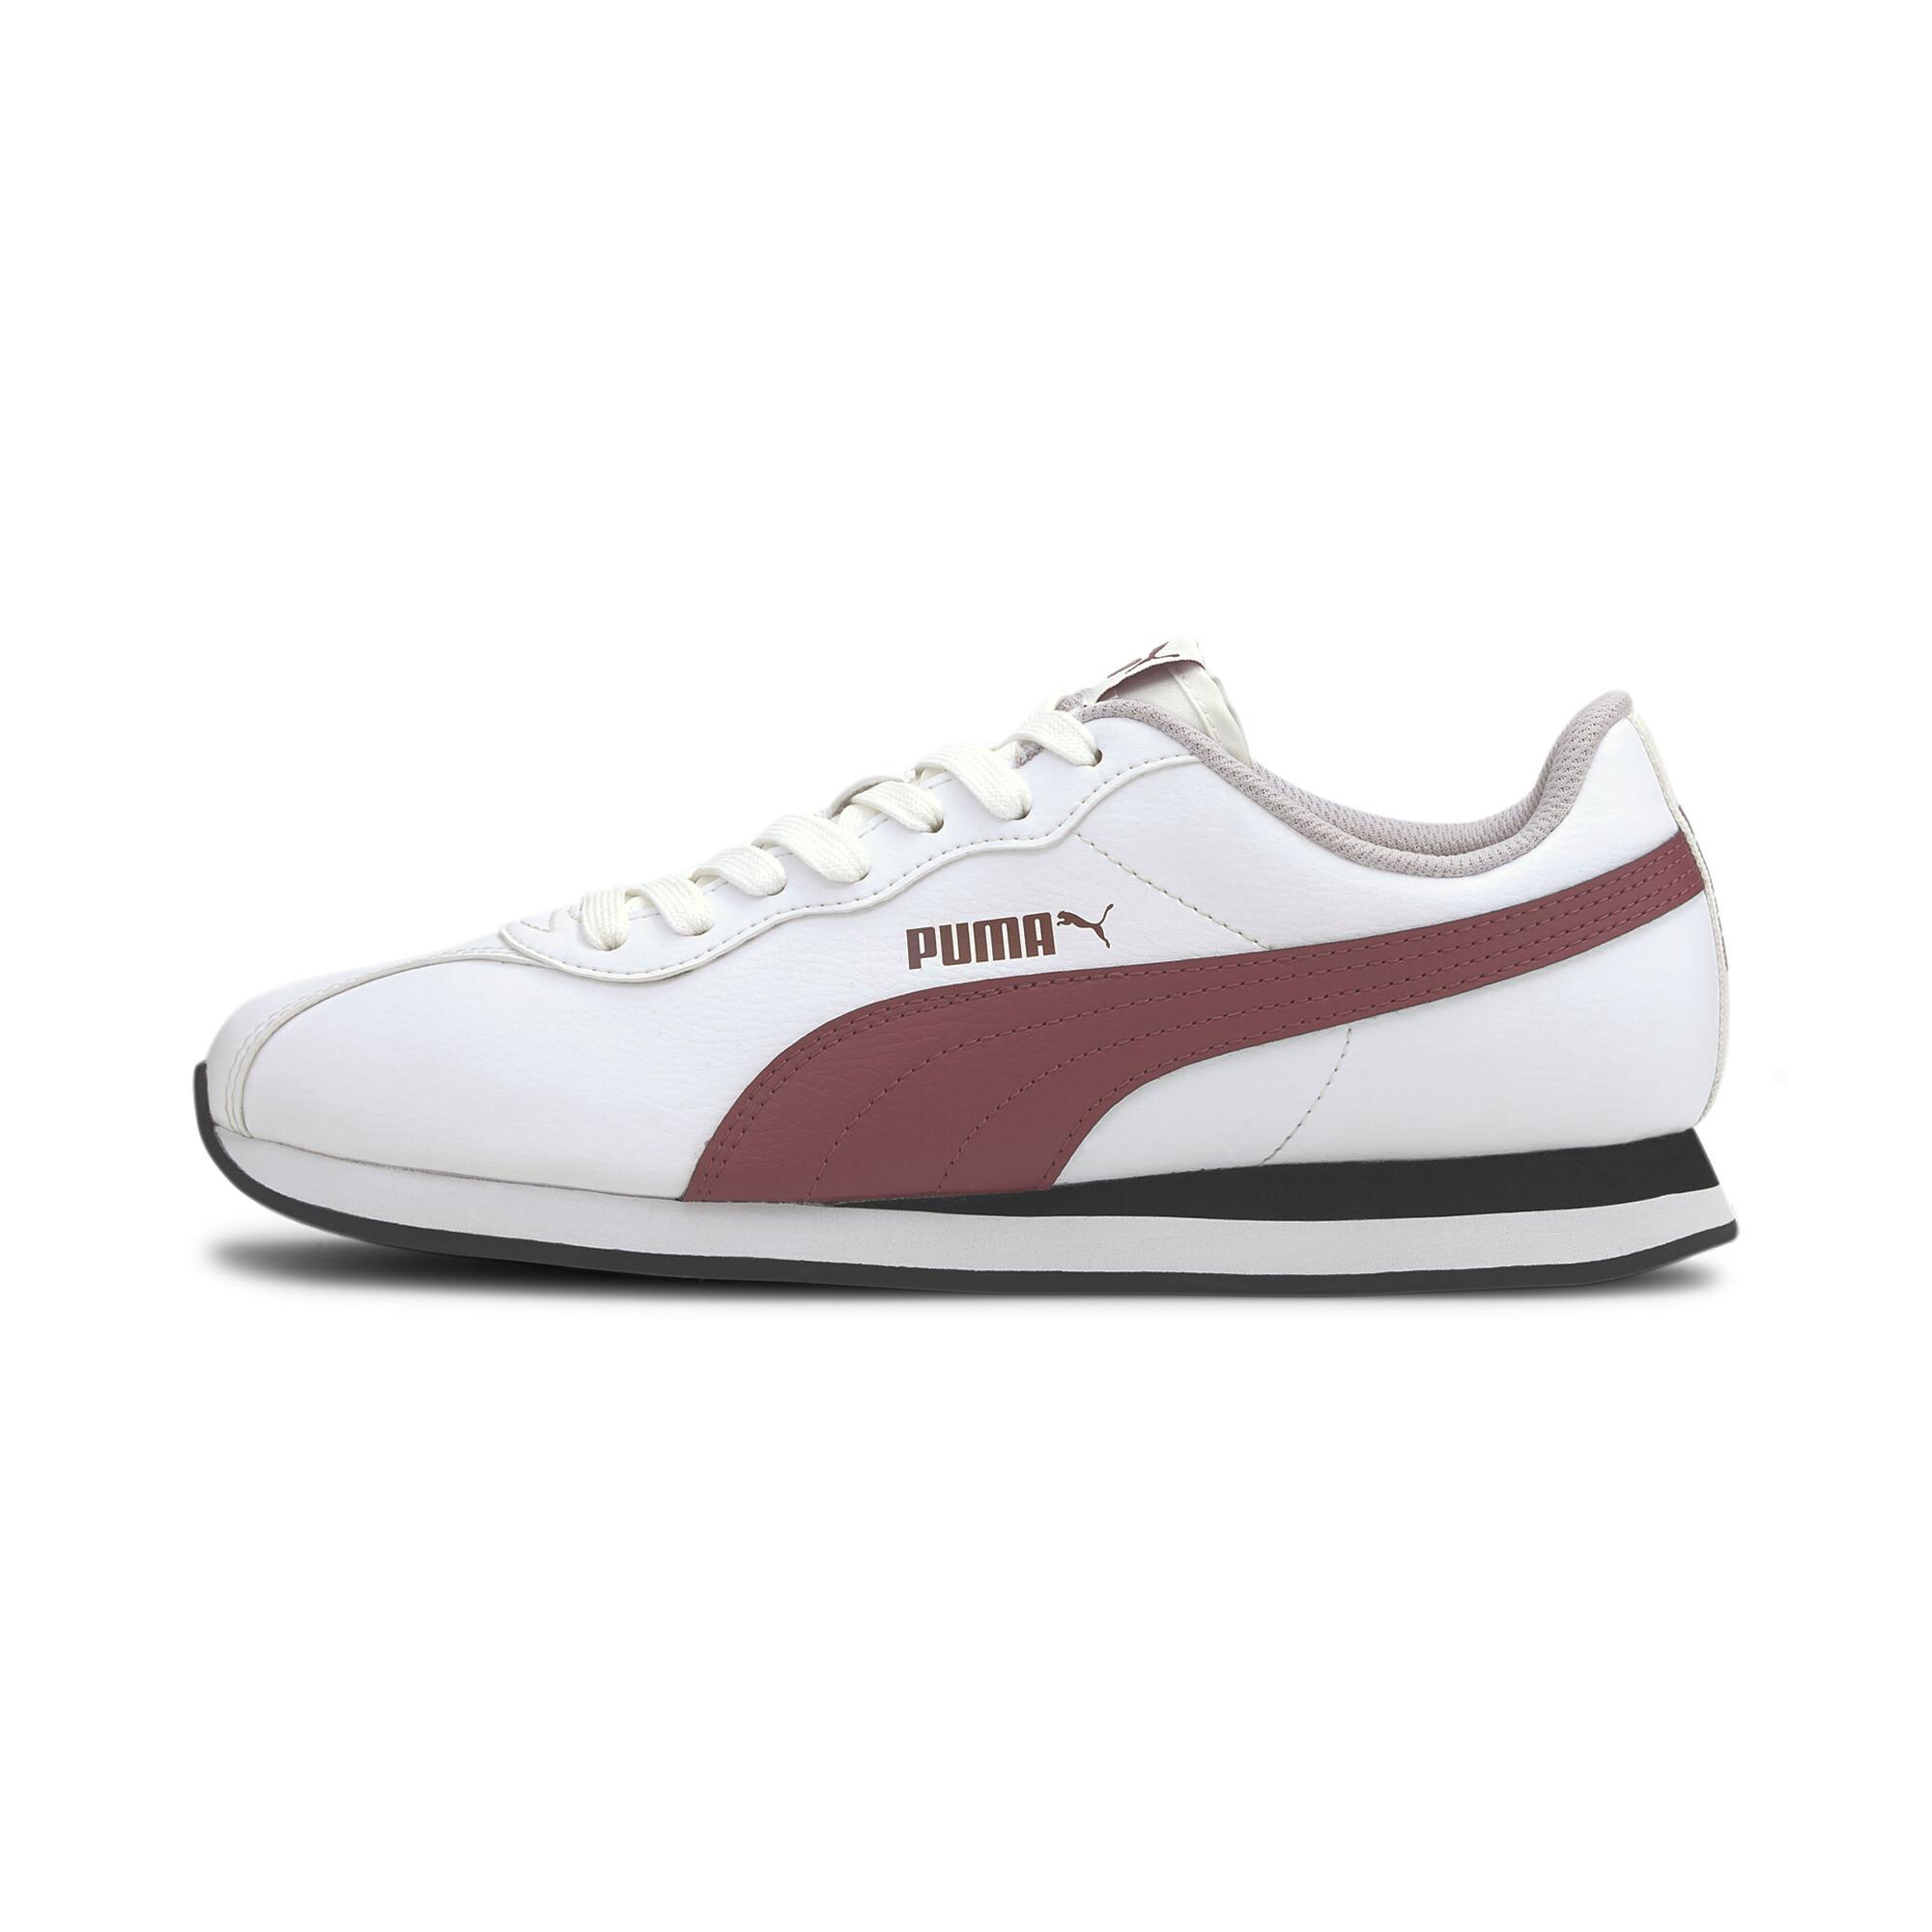 thumbnail 31 - PUMA Men's Turin II Sneakers